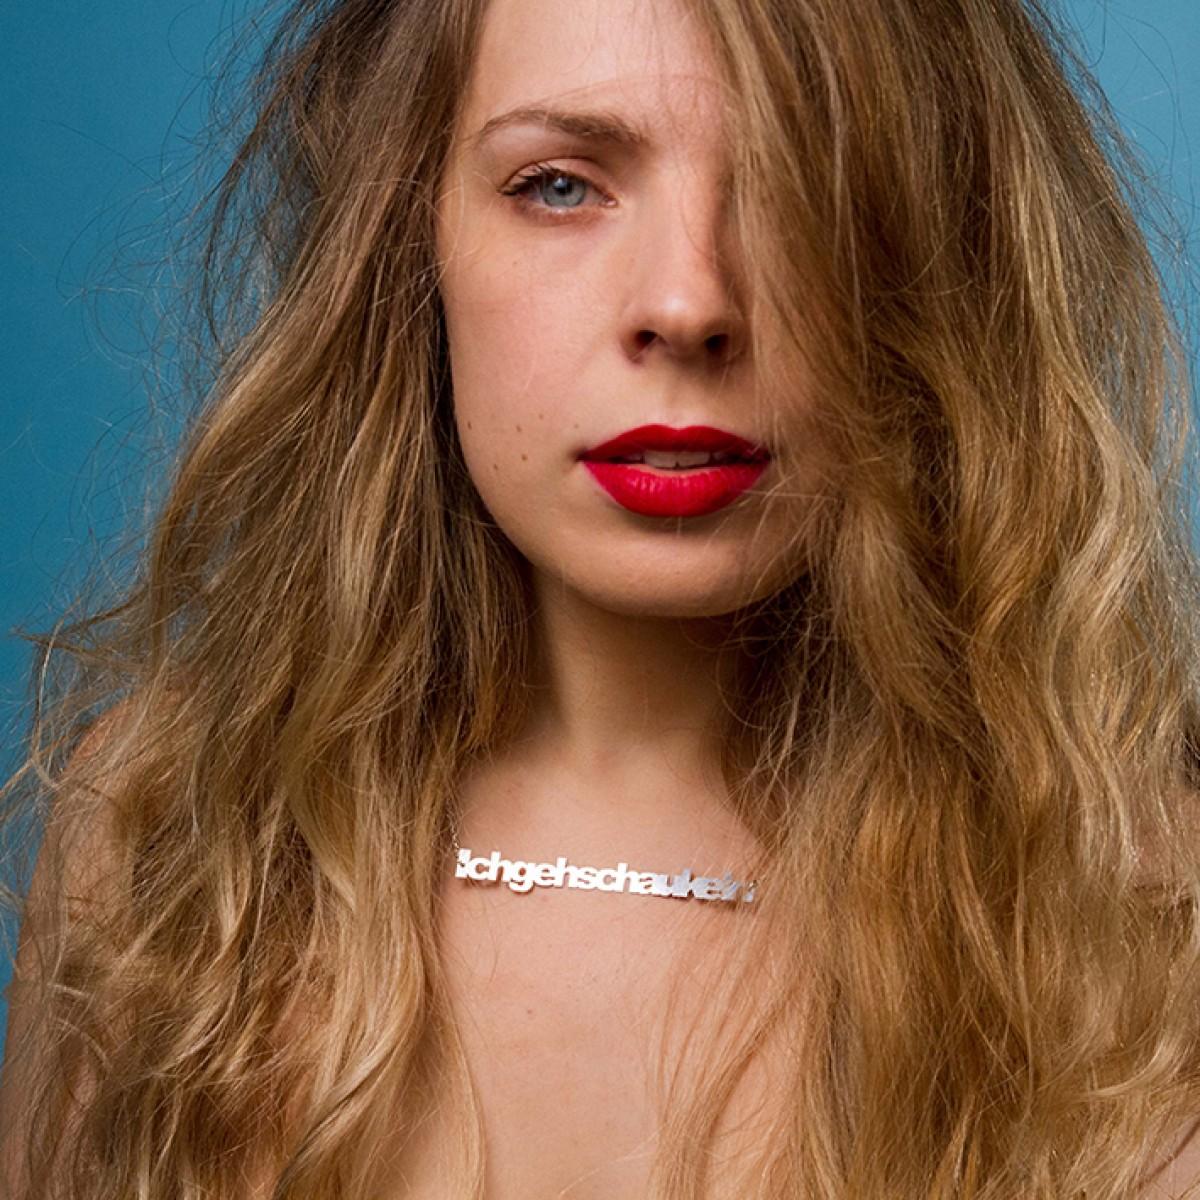 haloa jewellery SCHAUKELN I Halskette